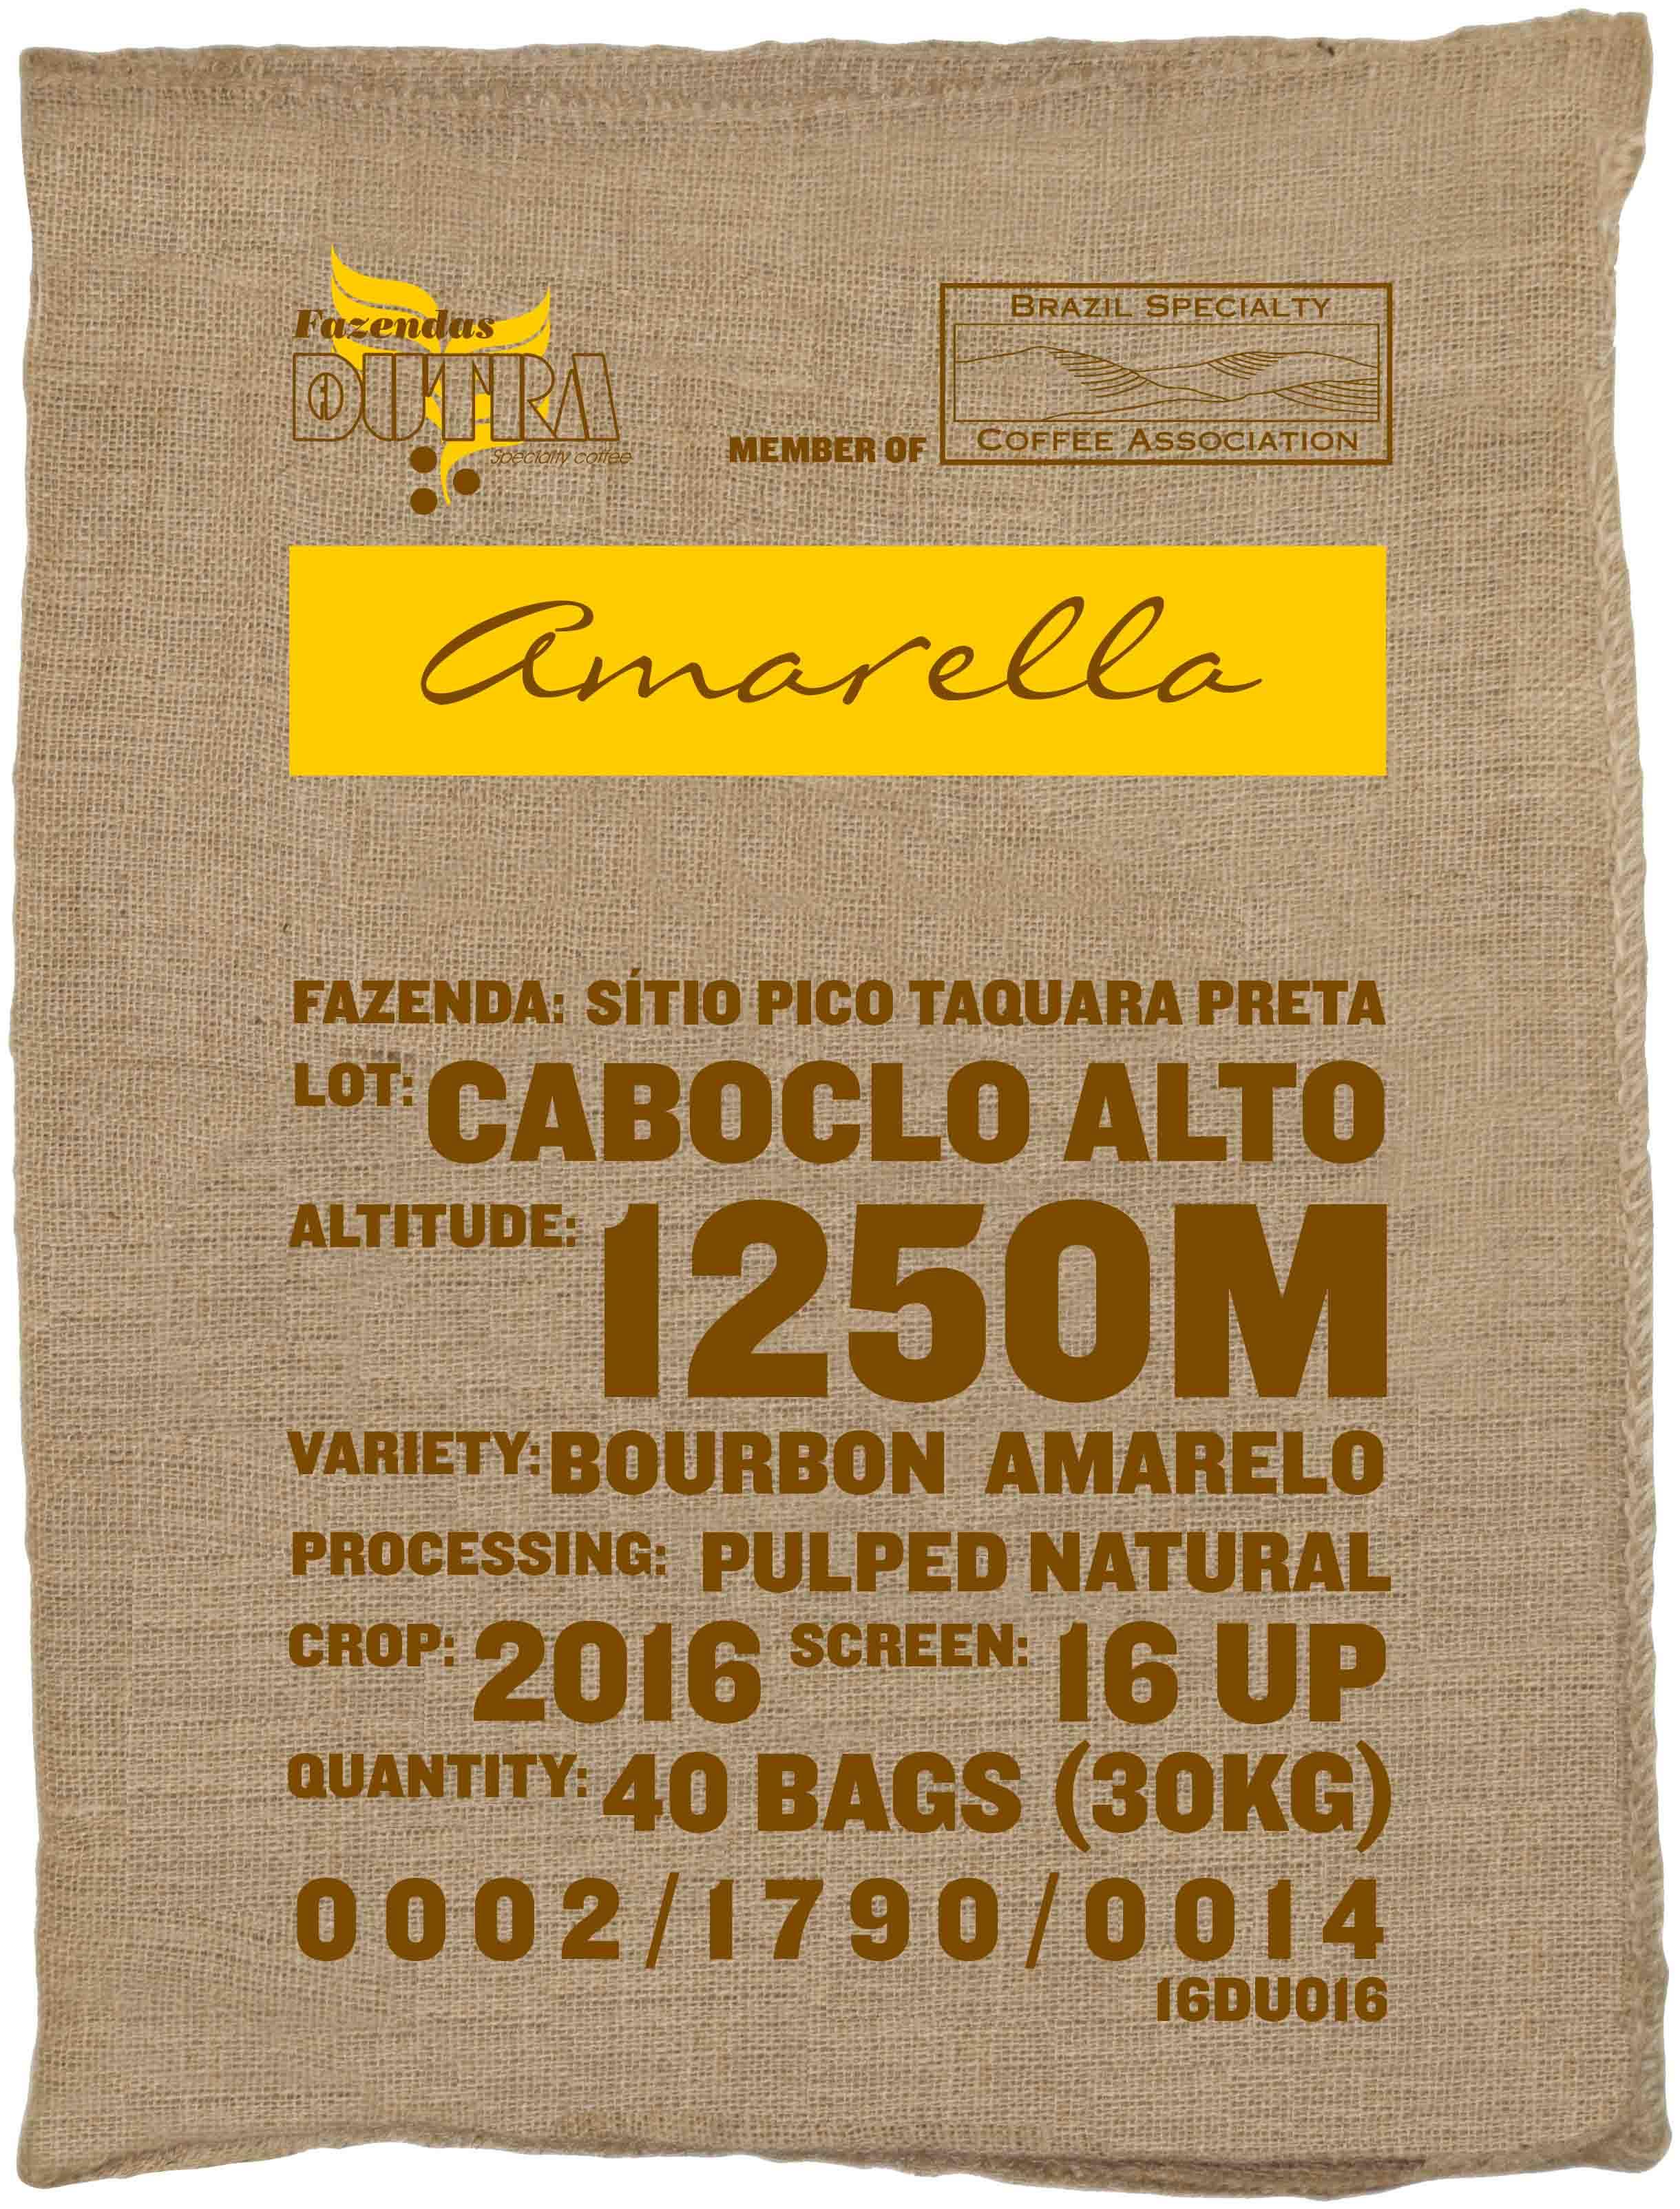 Ein Rohkaffeesack amarella Parzellenkaffee Varietät Bourbon amarelo. Fazendas Dutra Lot Caboclo Alto.